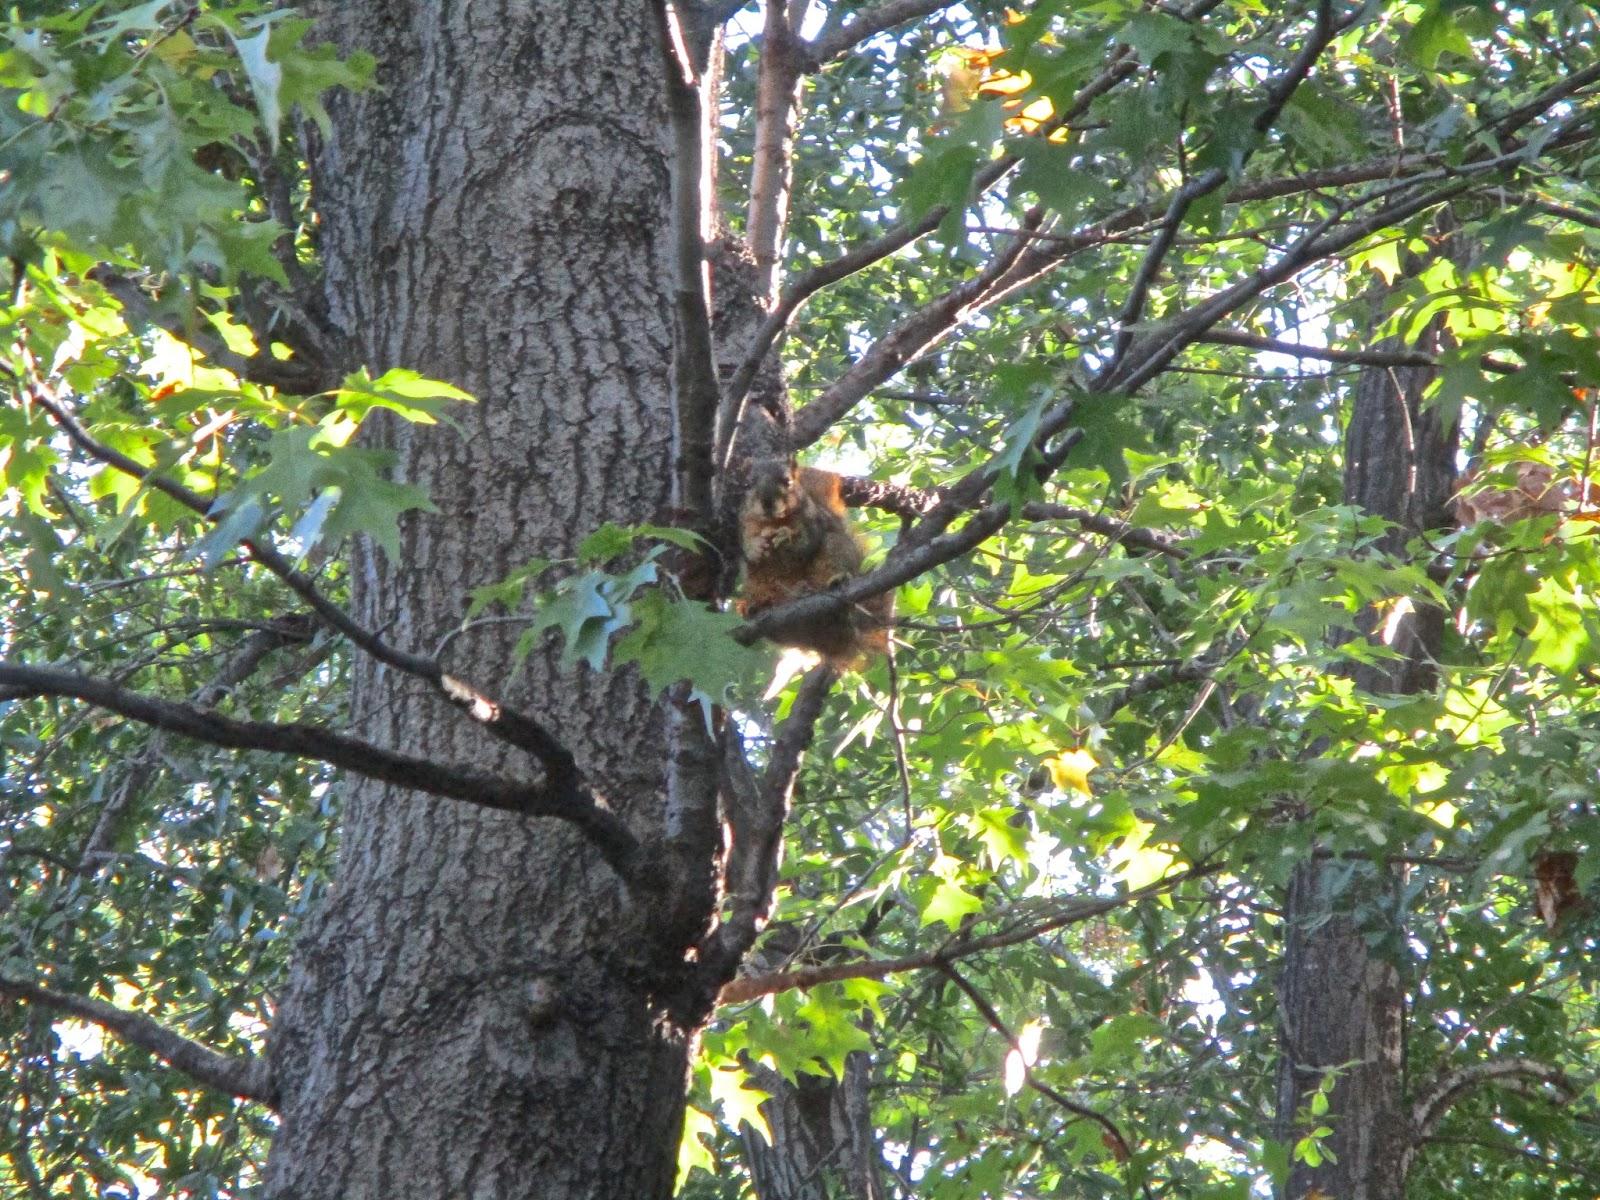 jkwgalleries: Squirrels, Birds, Fountain, Red Leaves ...